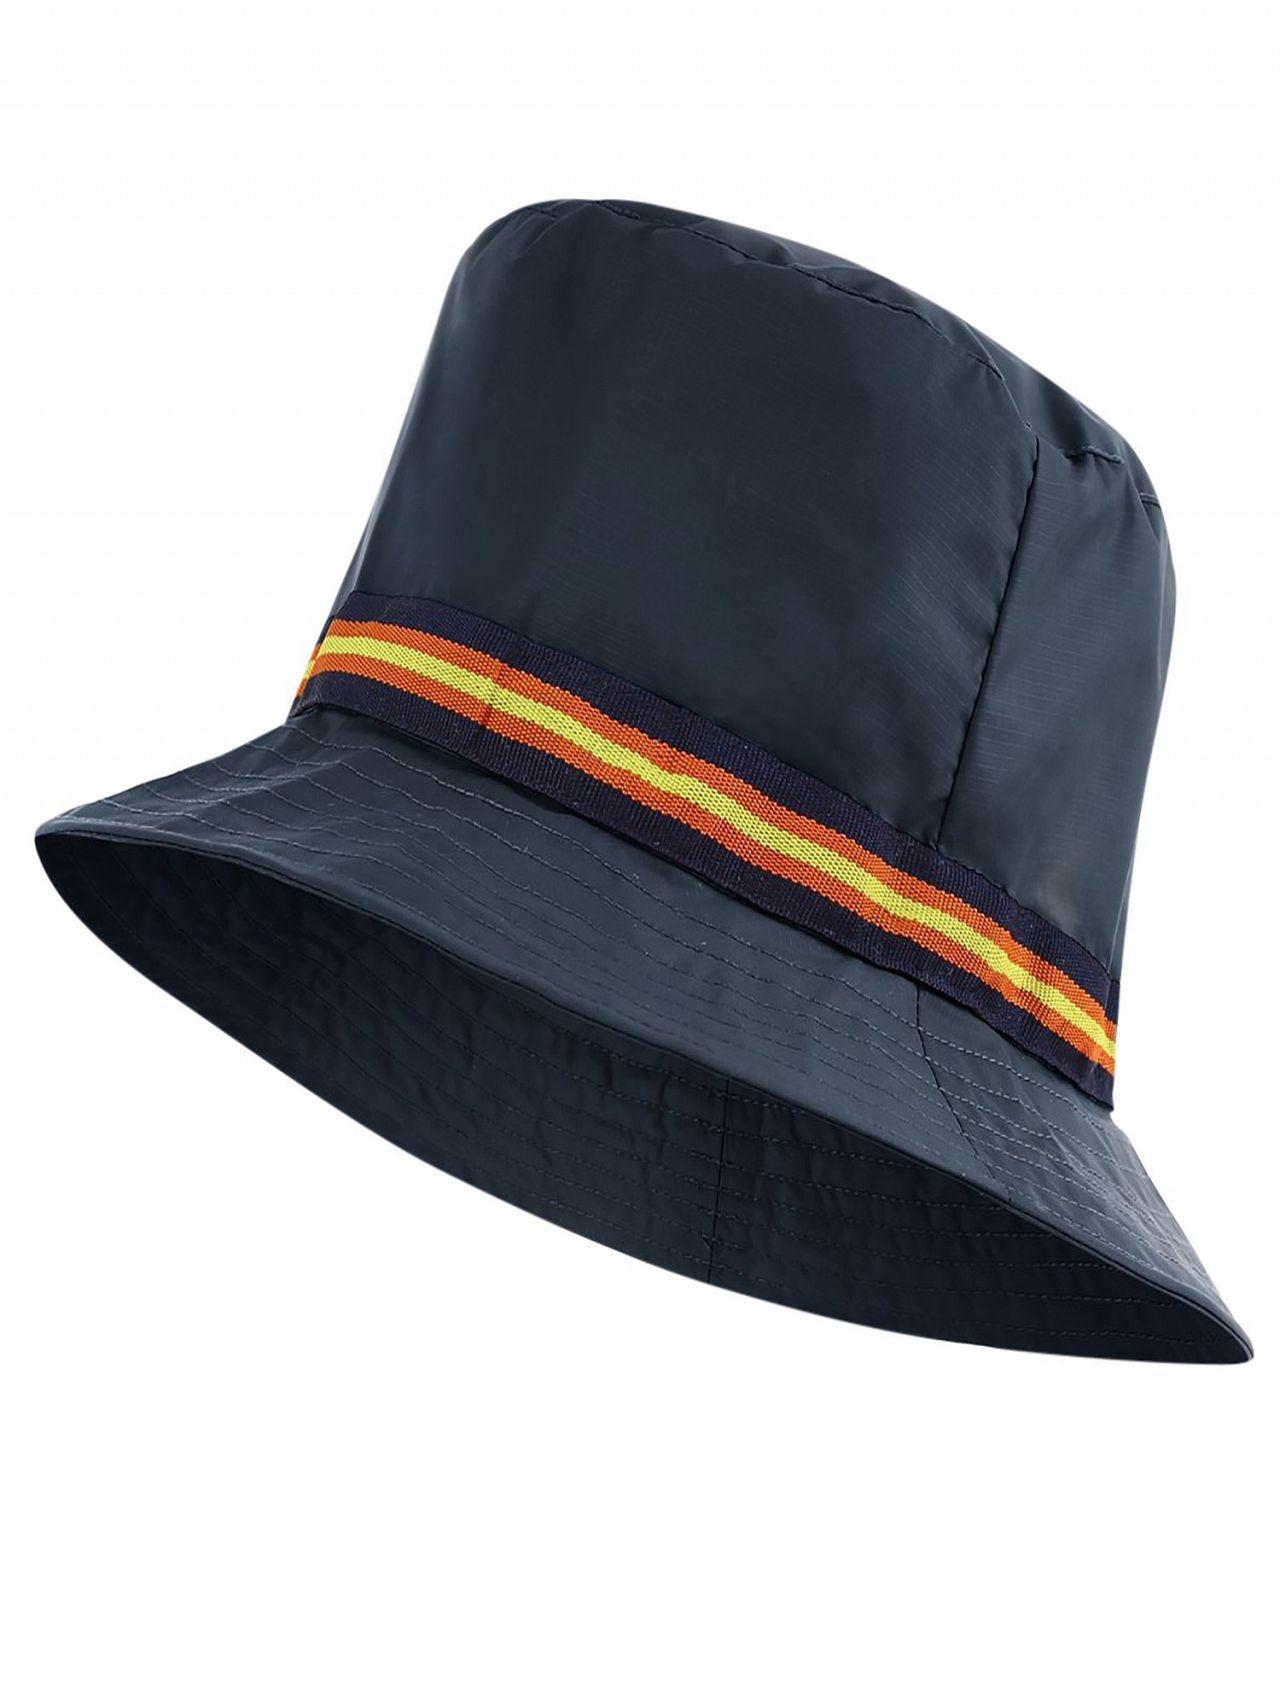 abebf24c3a2 K-Way Blue Depht Le Vrai 3.0 Pascal Tape Hat in Blue for Men - Lyst